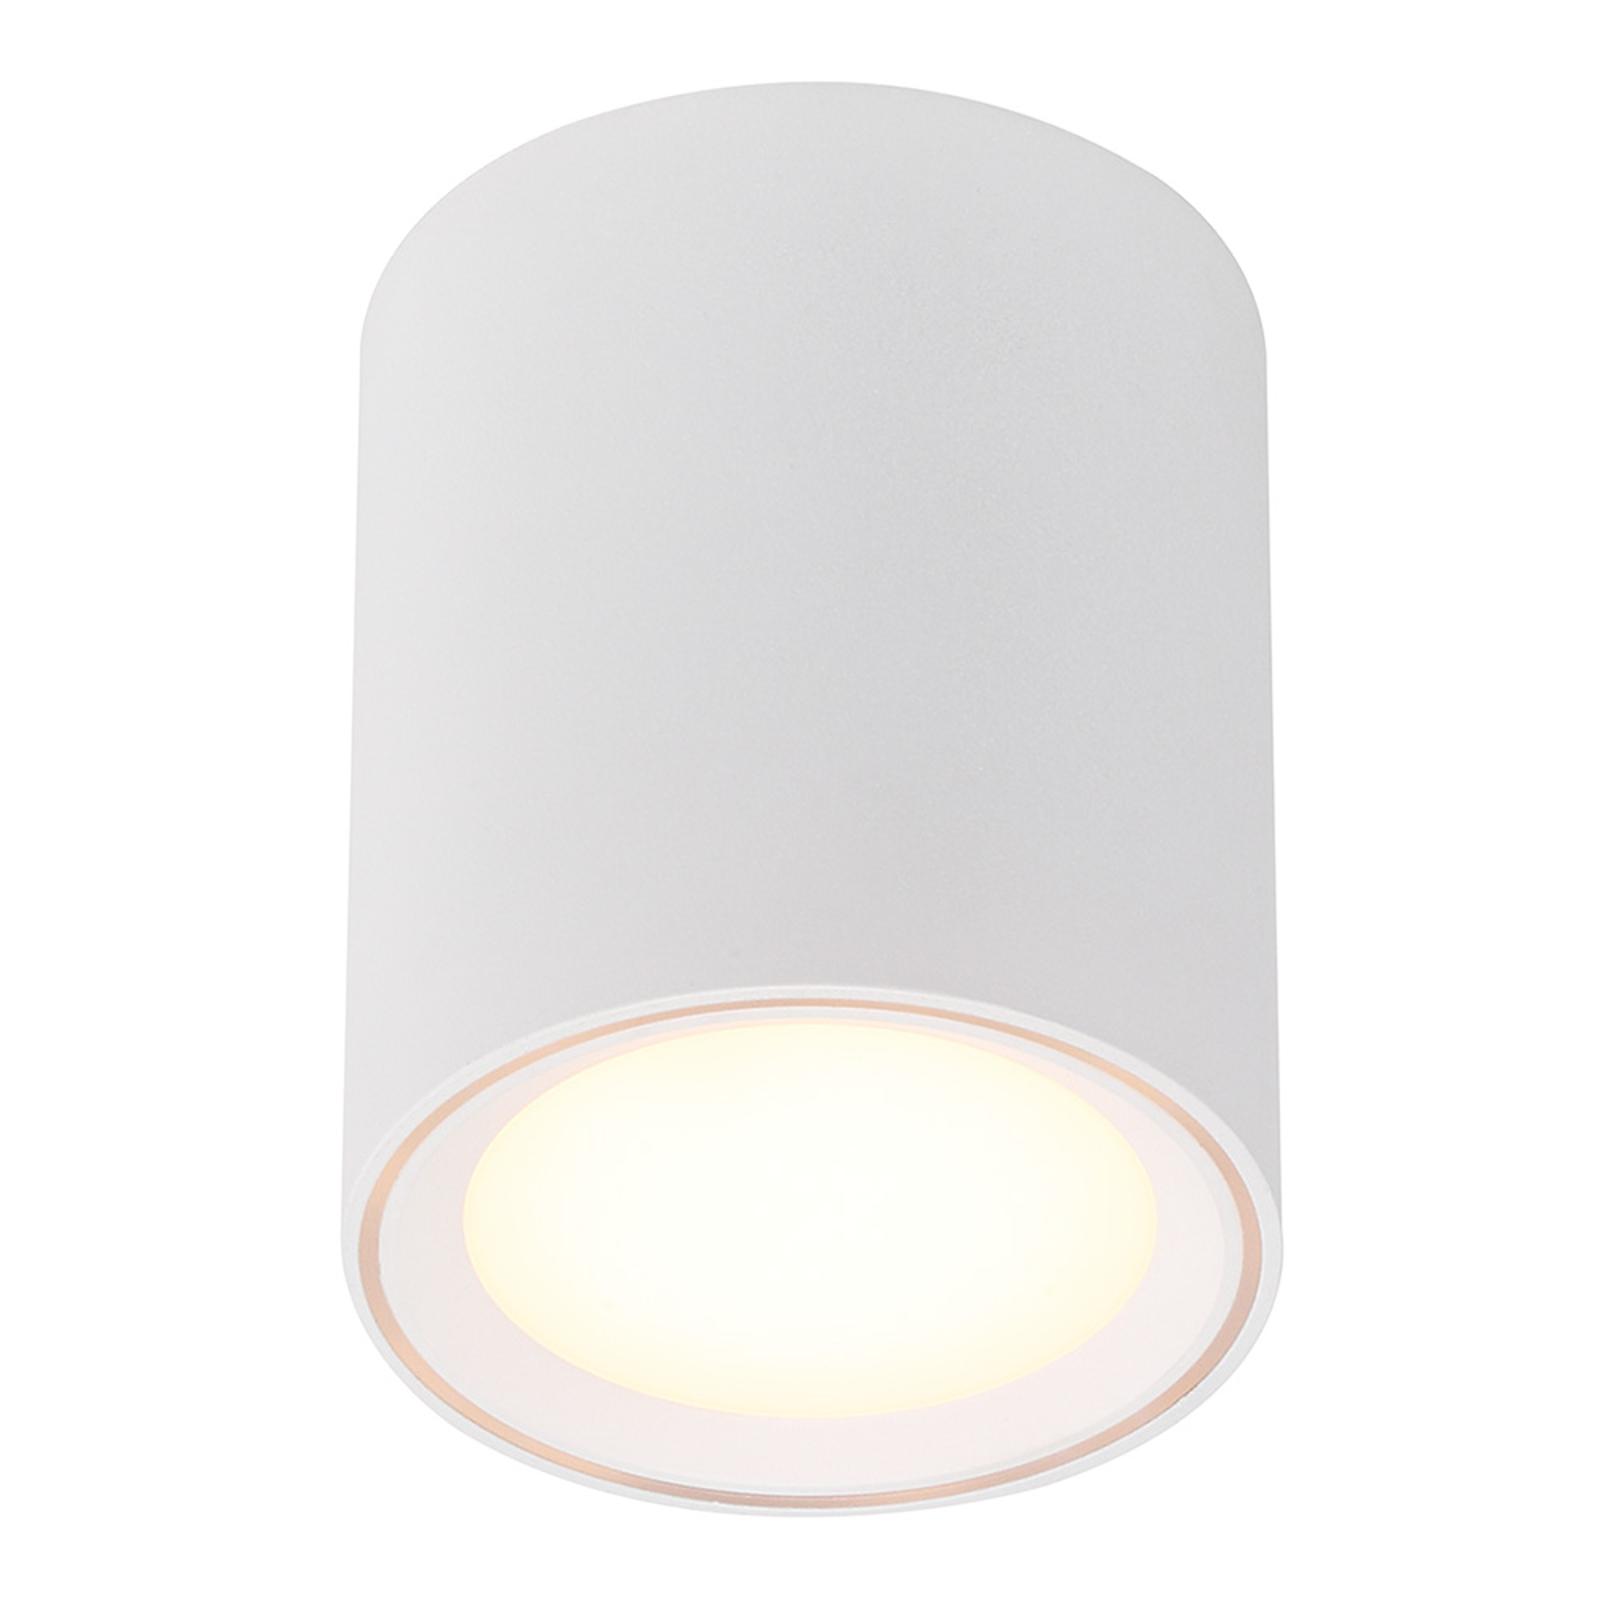 Lampa sufitowa LED Fallon, wysokość 12 cm